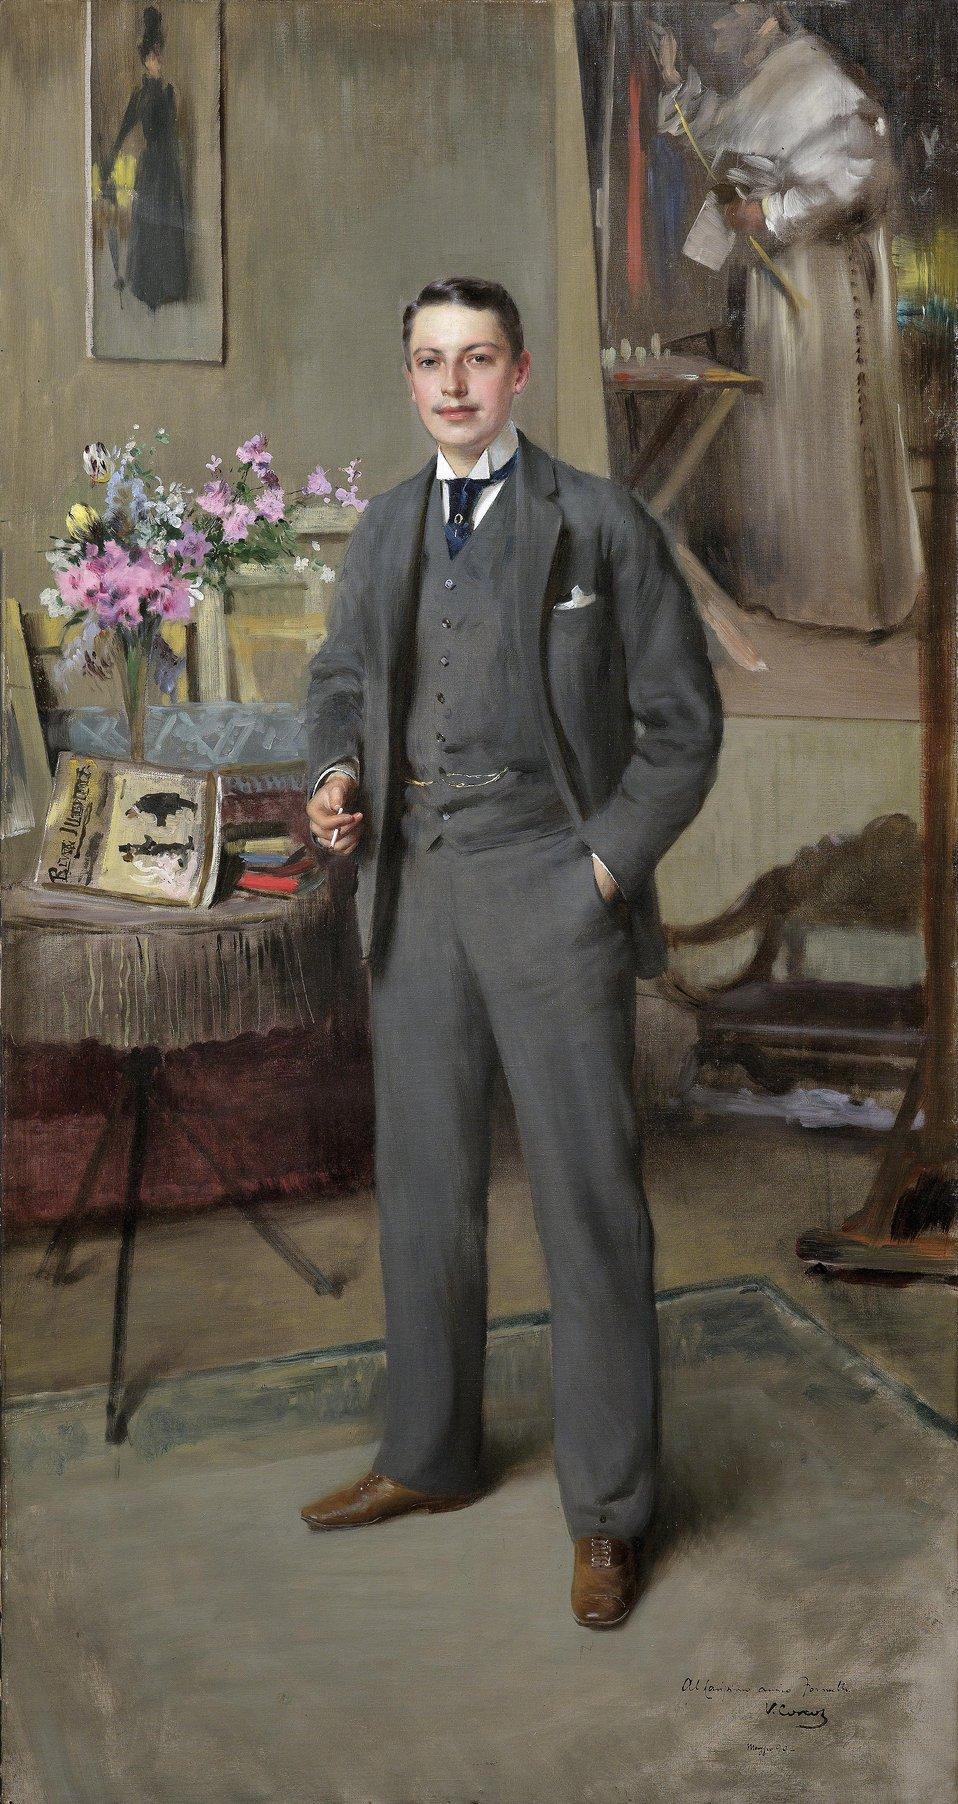 Vittorio Matteo Corcos Herrenportrait 1890.jpg